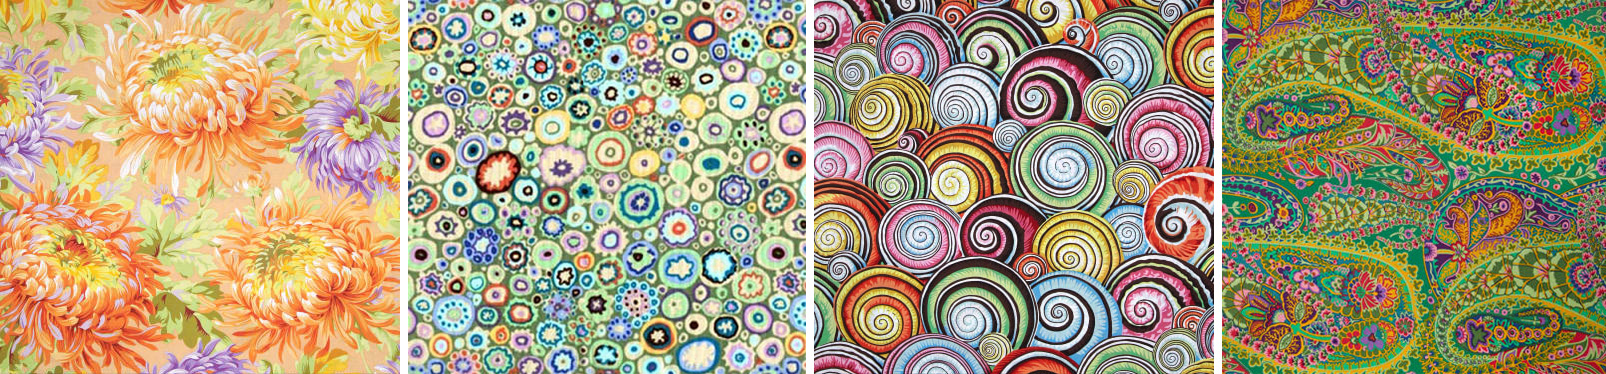 Quilting patterns by Kaffe Fassett